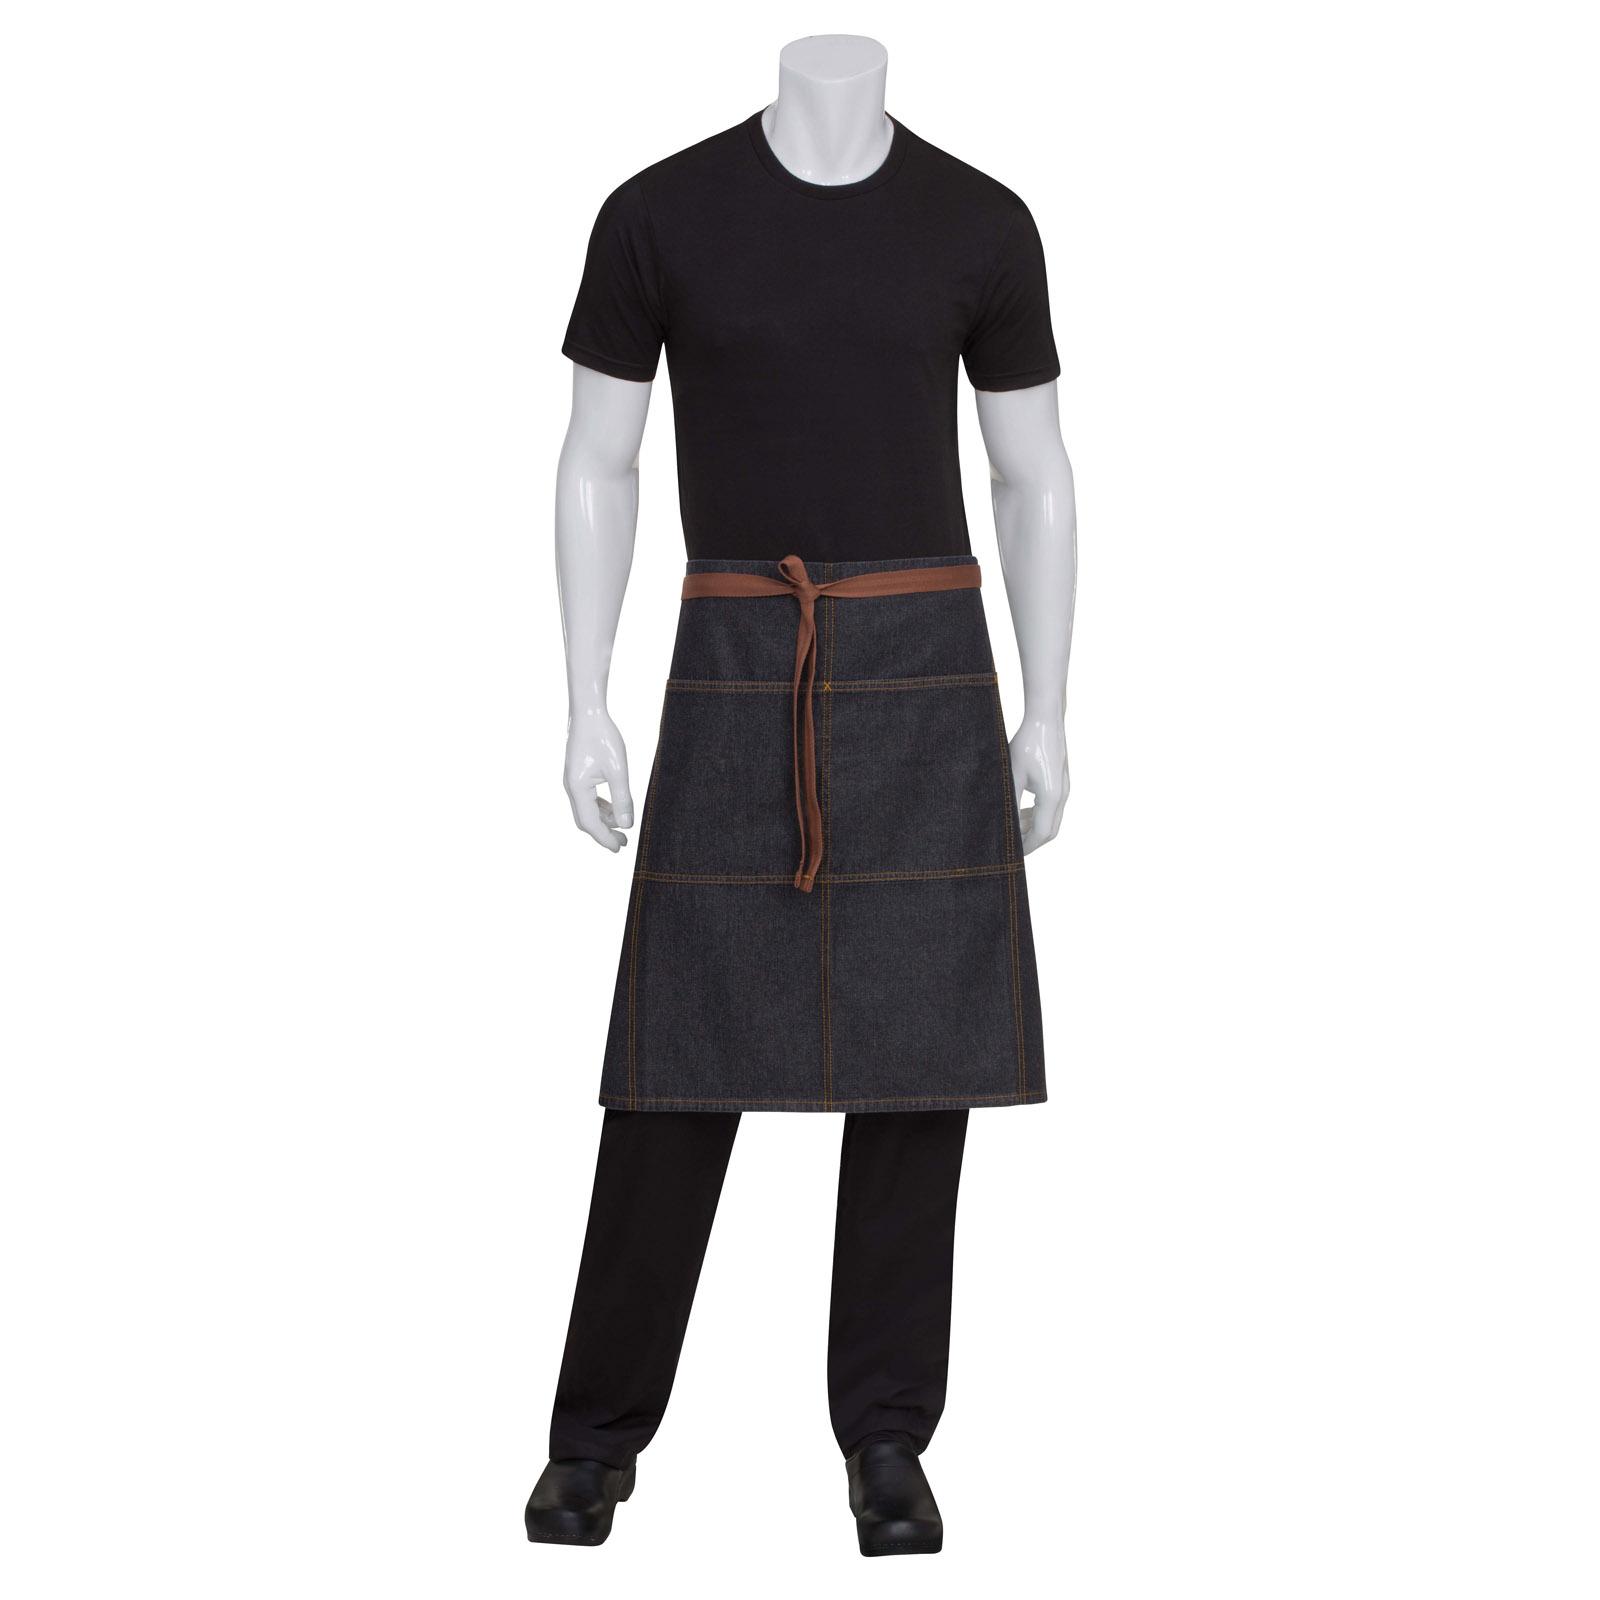 Chef Works AW049BLK0 waist apron